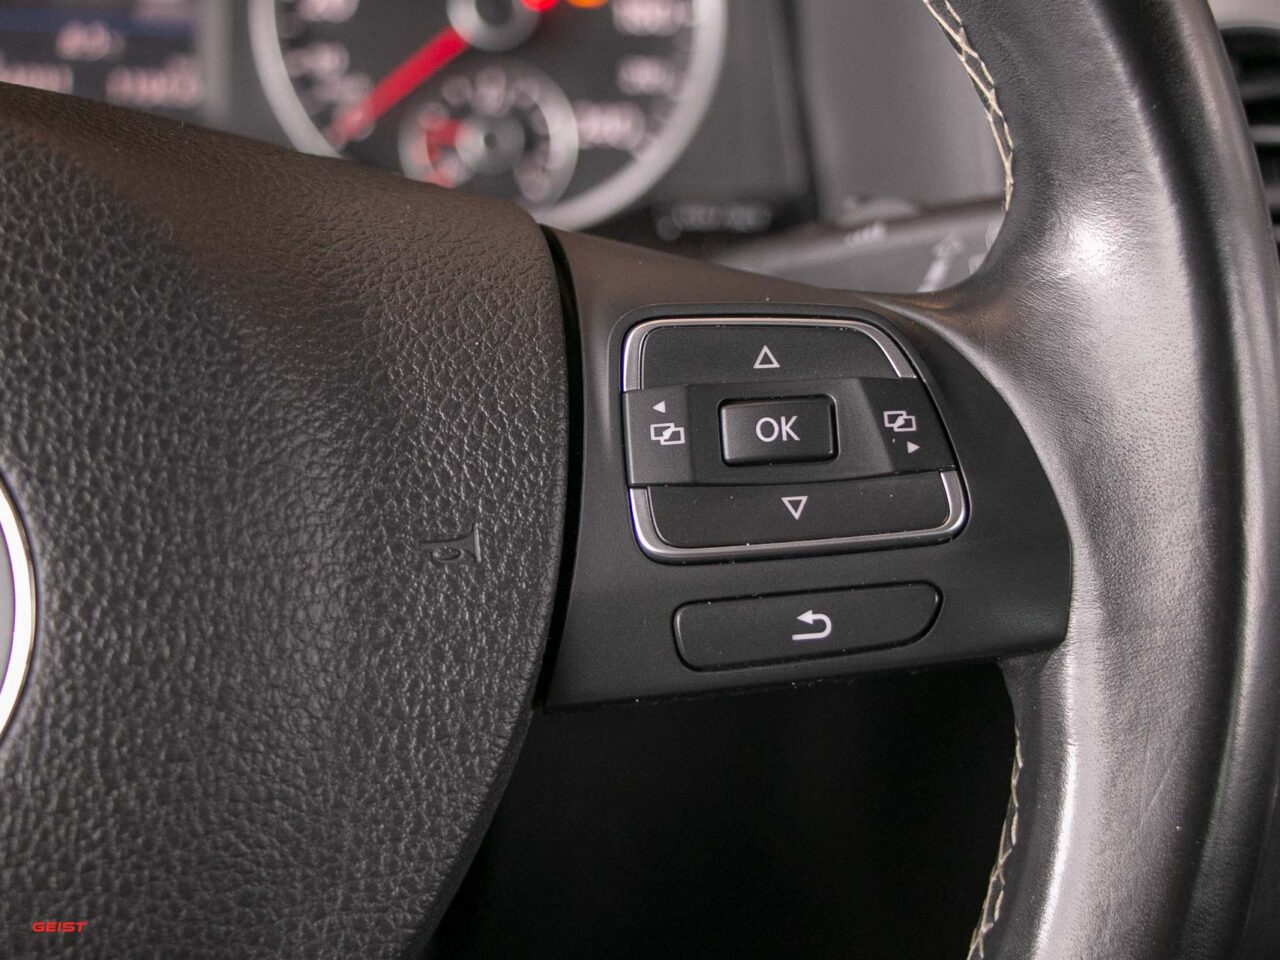 VW-TIGUAN-2015-manual-3475